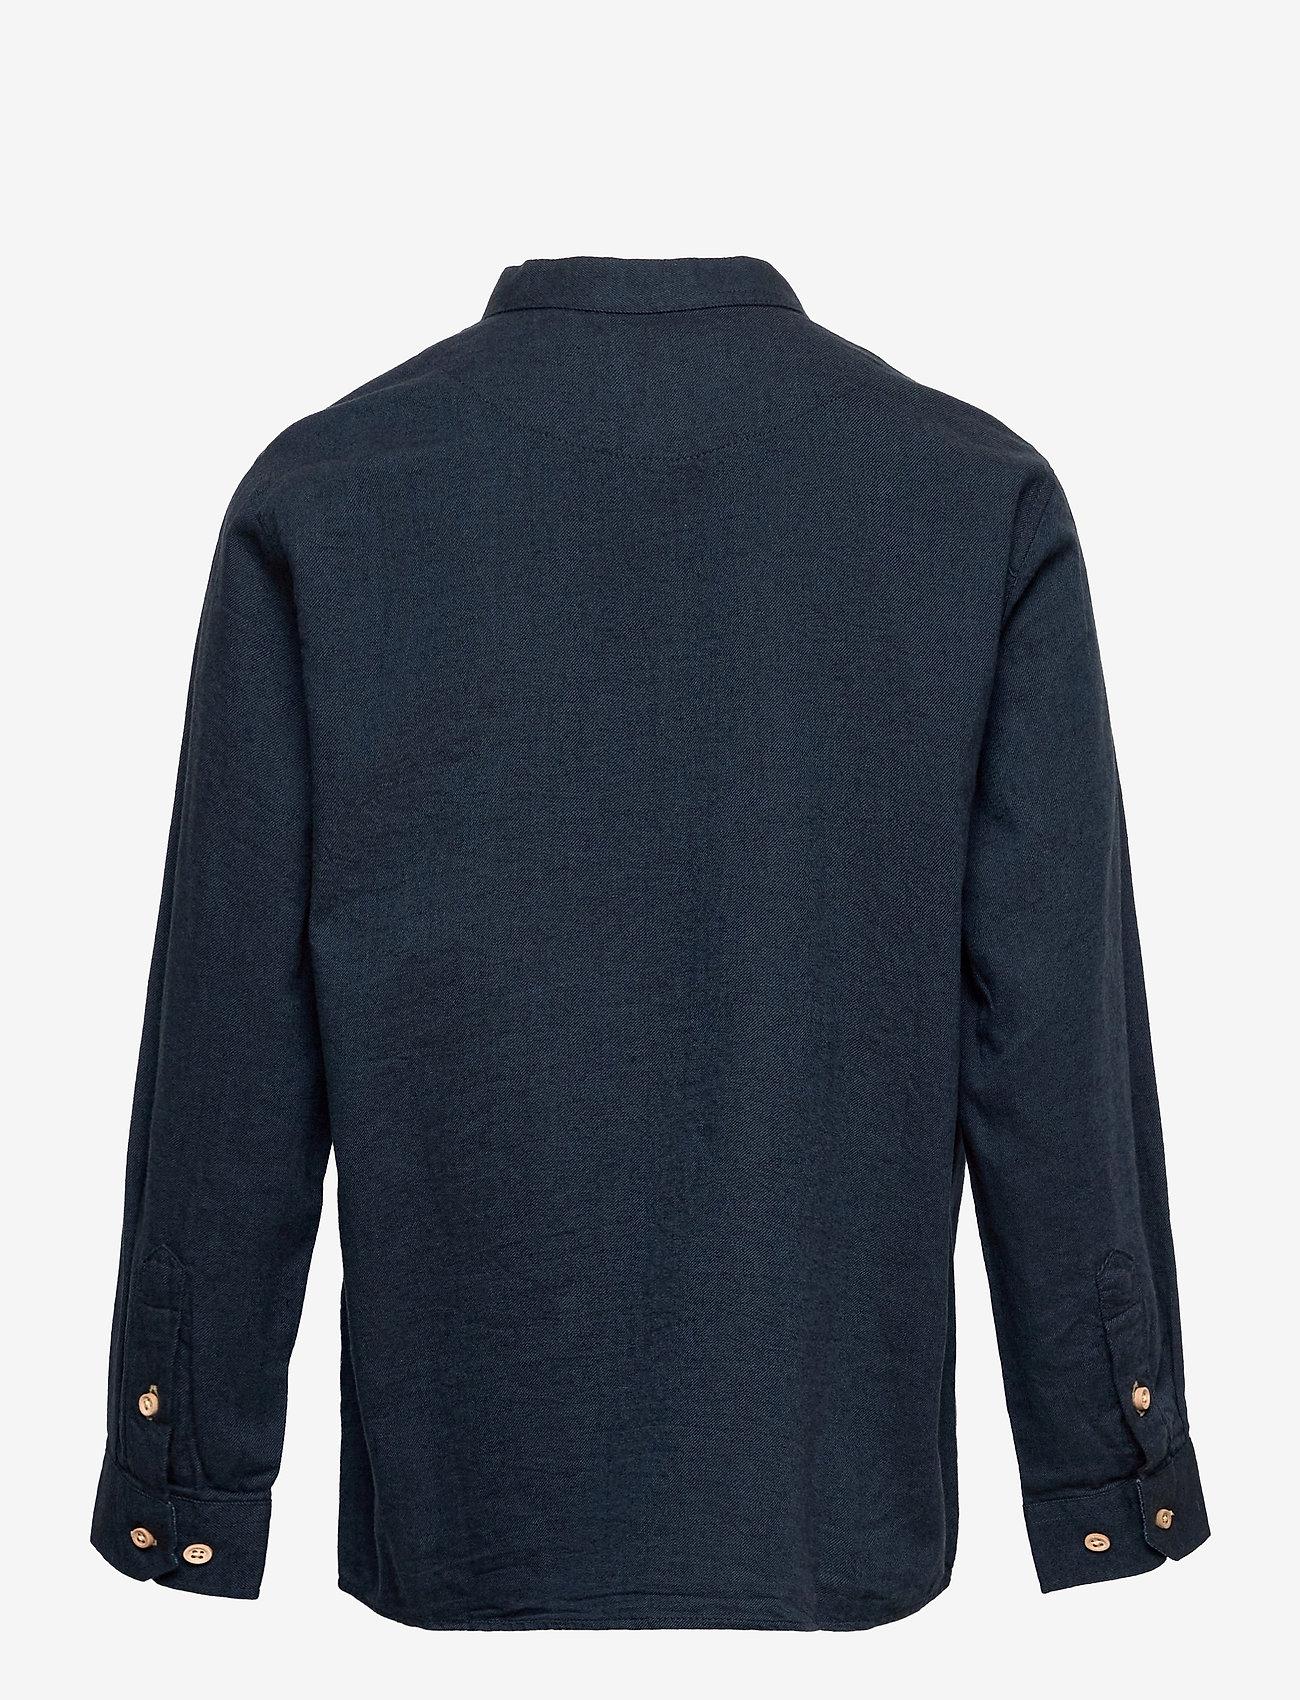 Kronstadt - Johan Henley Diego - shirts - navy - 1